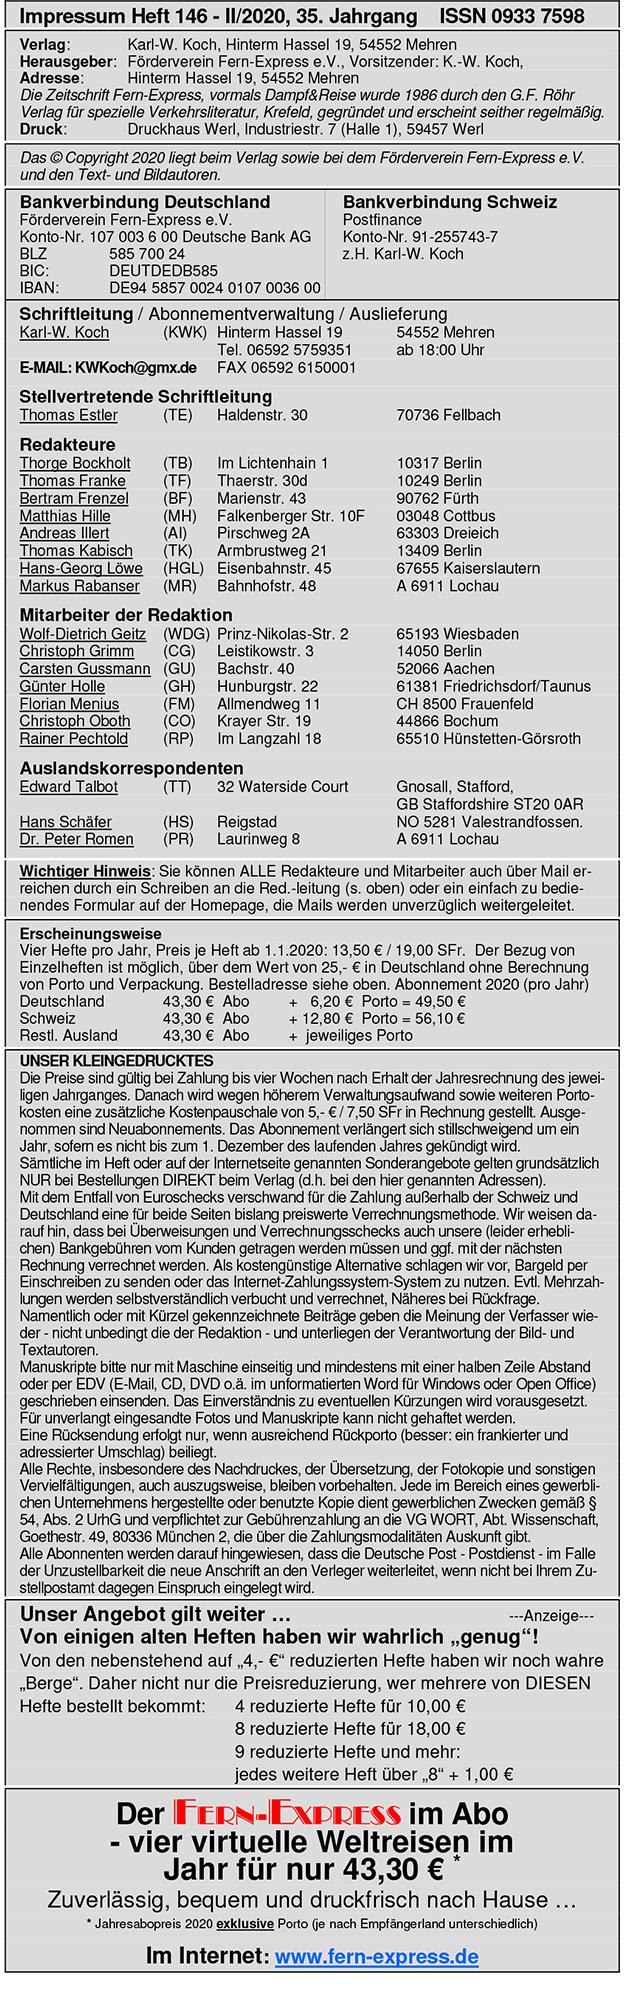 FernExpress: Impressum Heft 2/2020